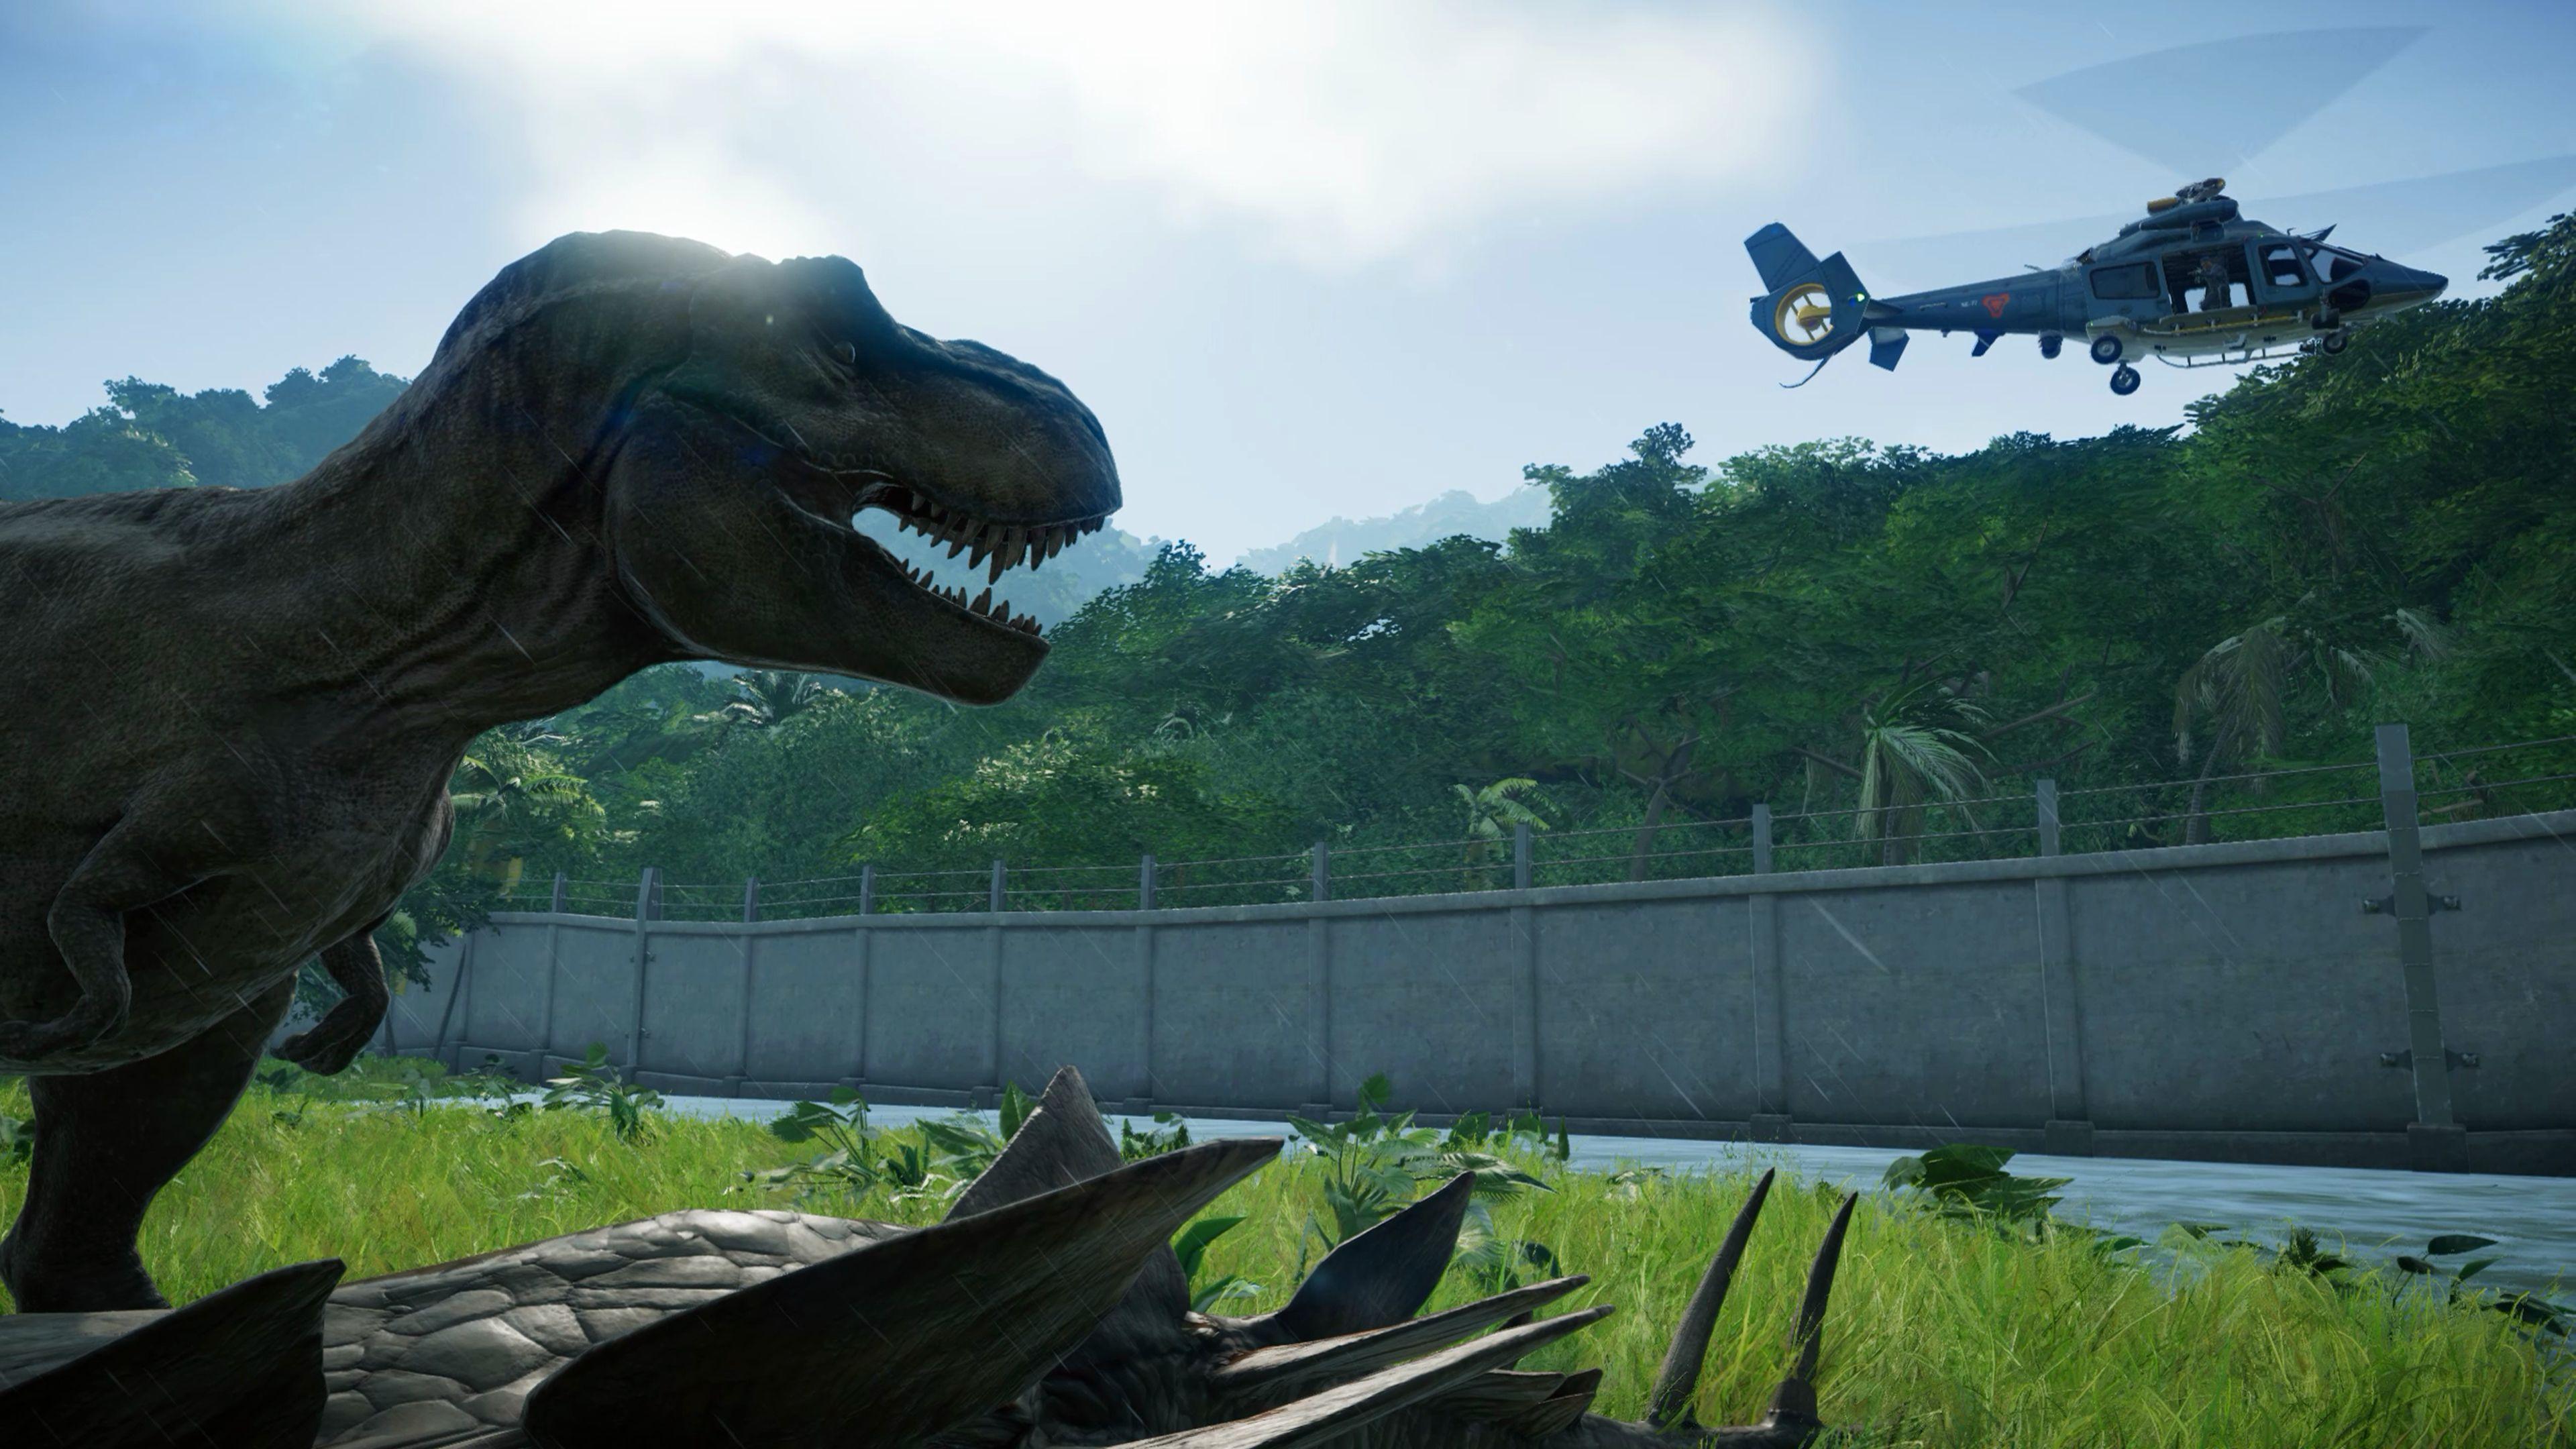 Скриншот №2 к Jurassic World Evolution издание «Парк Юрского периода»